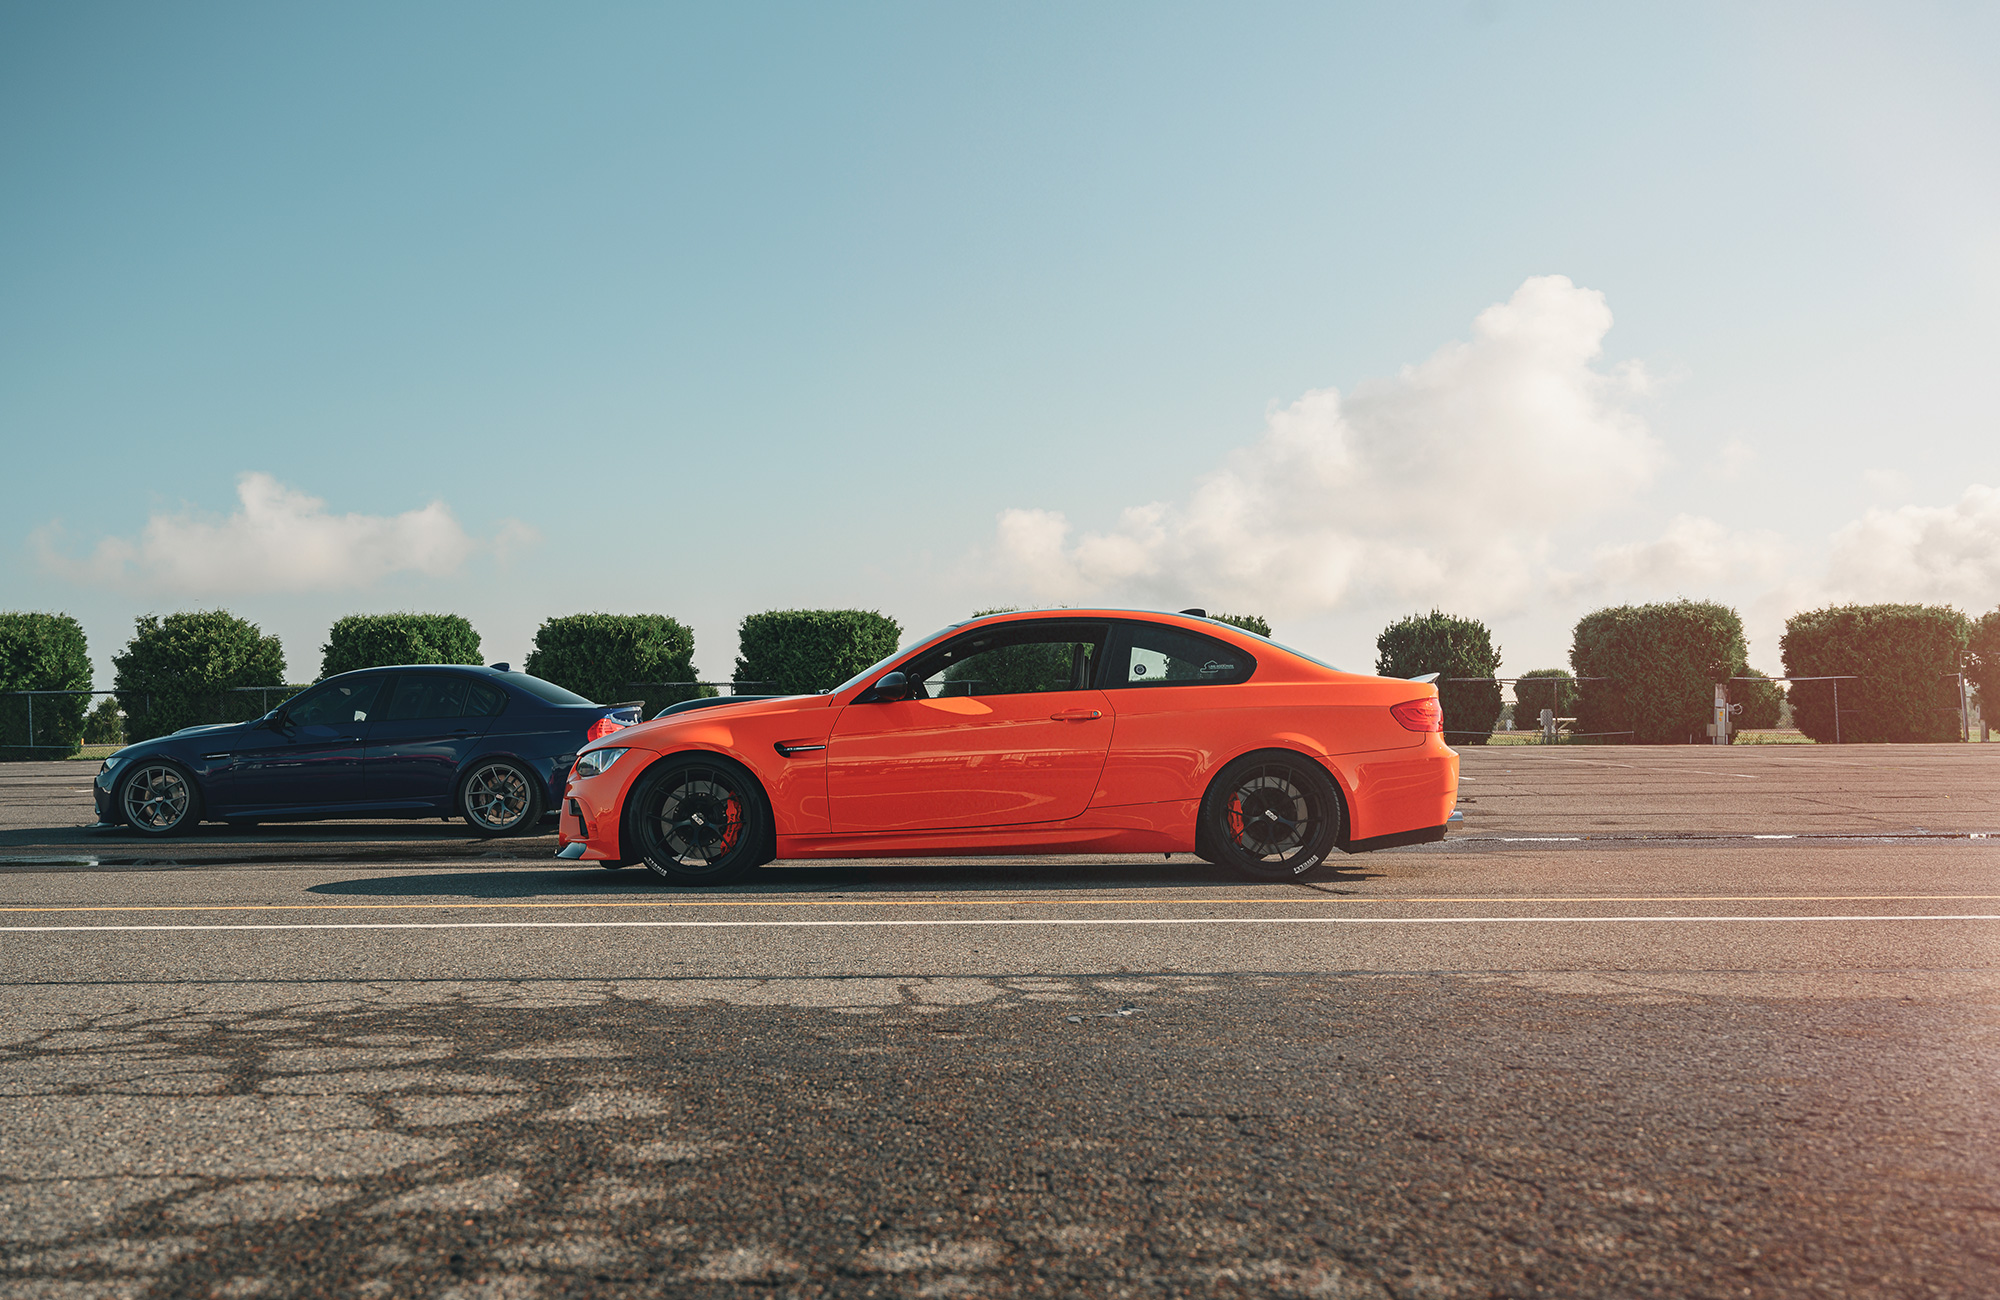 BMW M3s